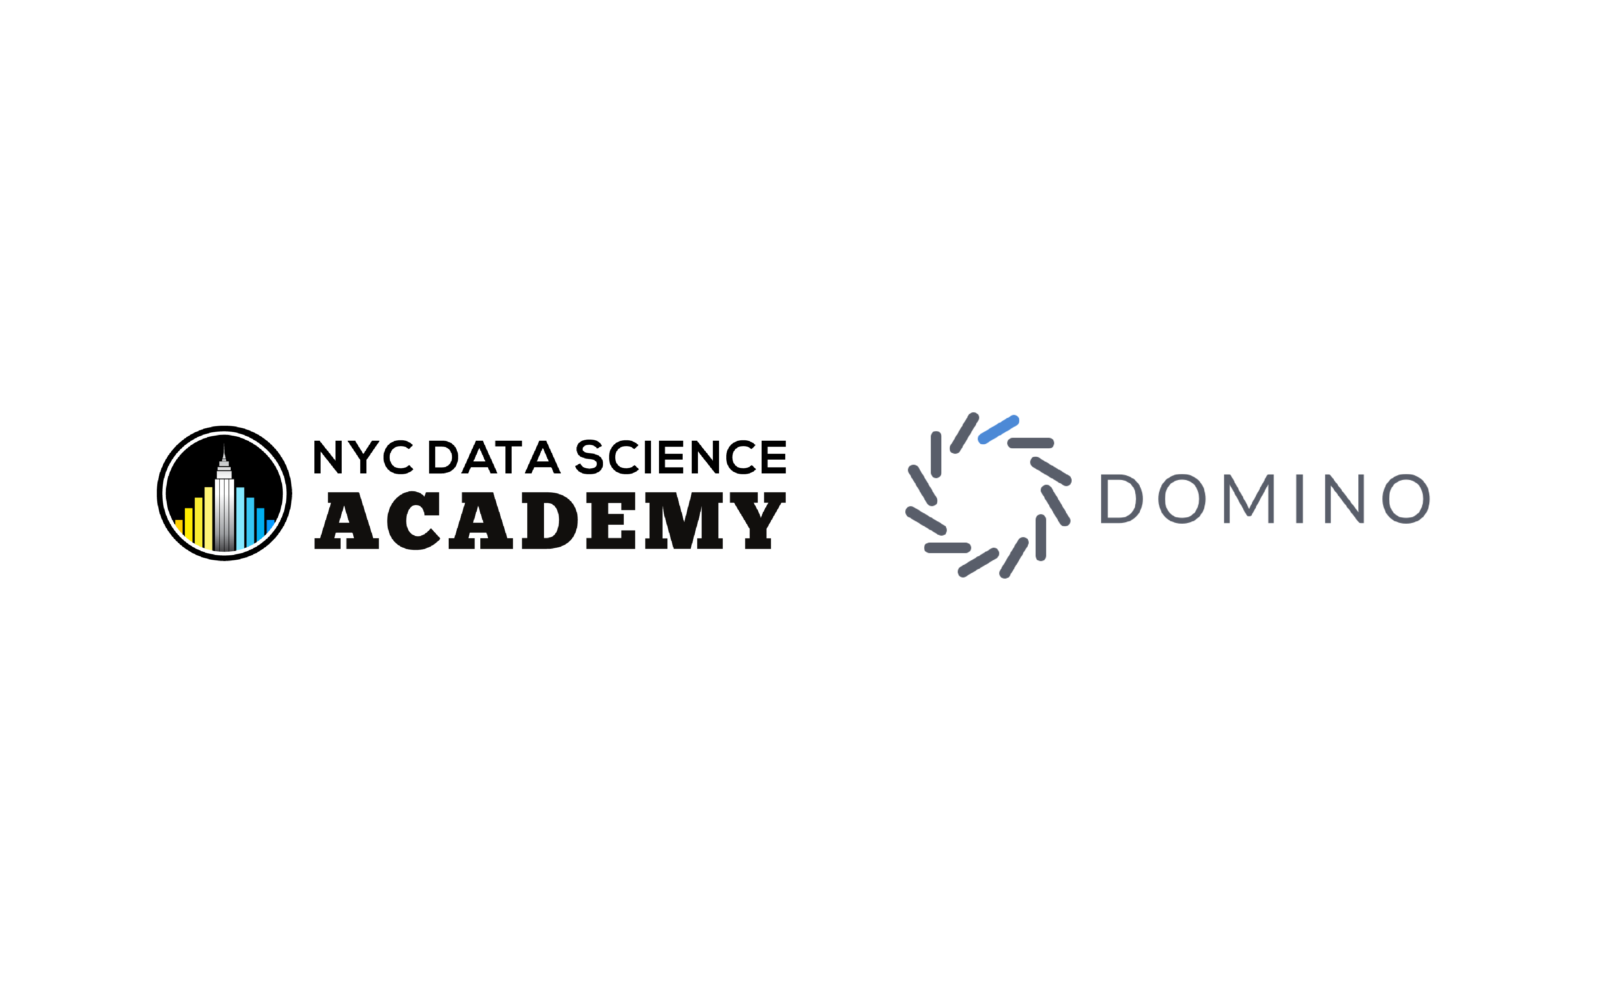 domino-data-lab-logo-nycdsa-e1478025064352